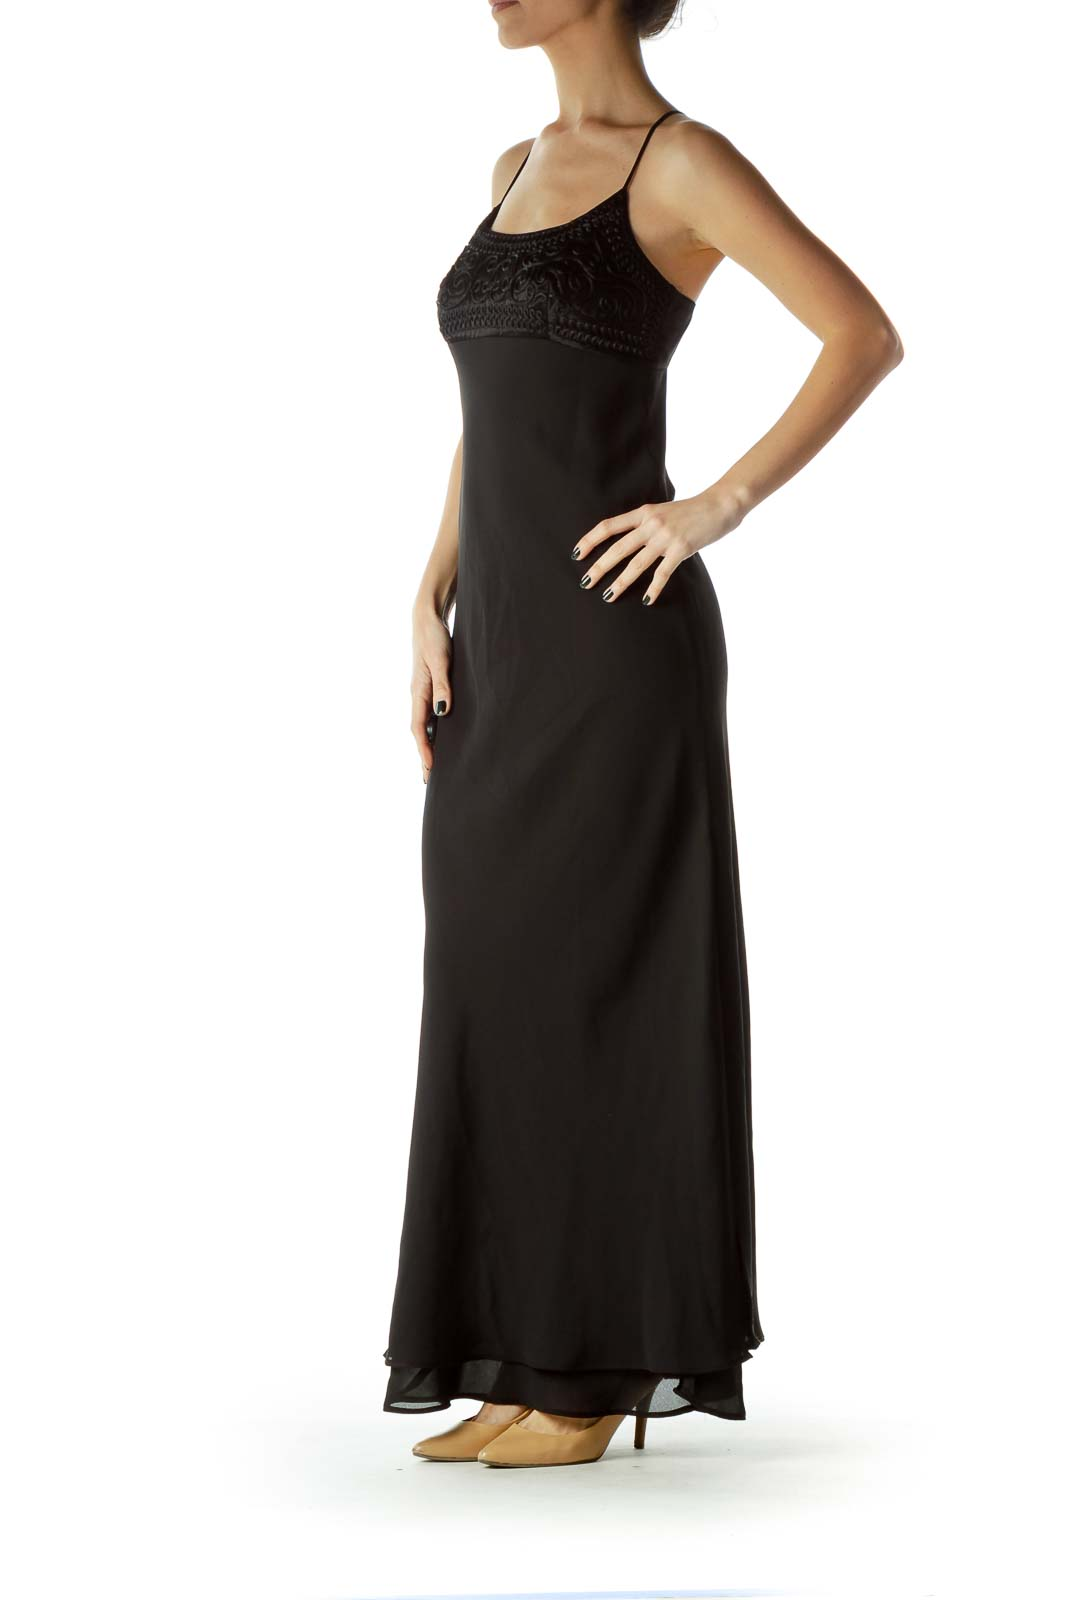 Black Spaghetti Strap Empire Waist Evening Dress